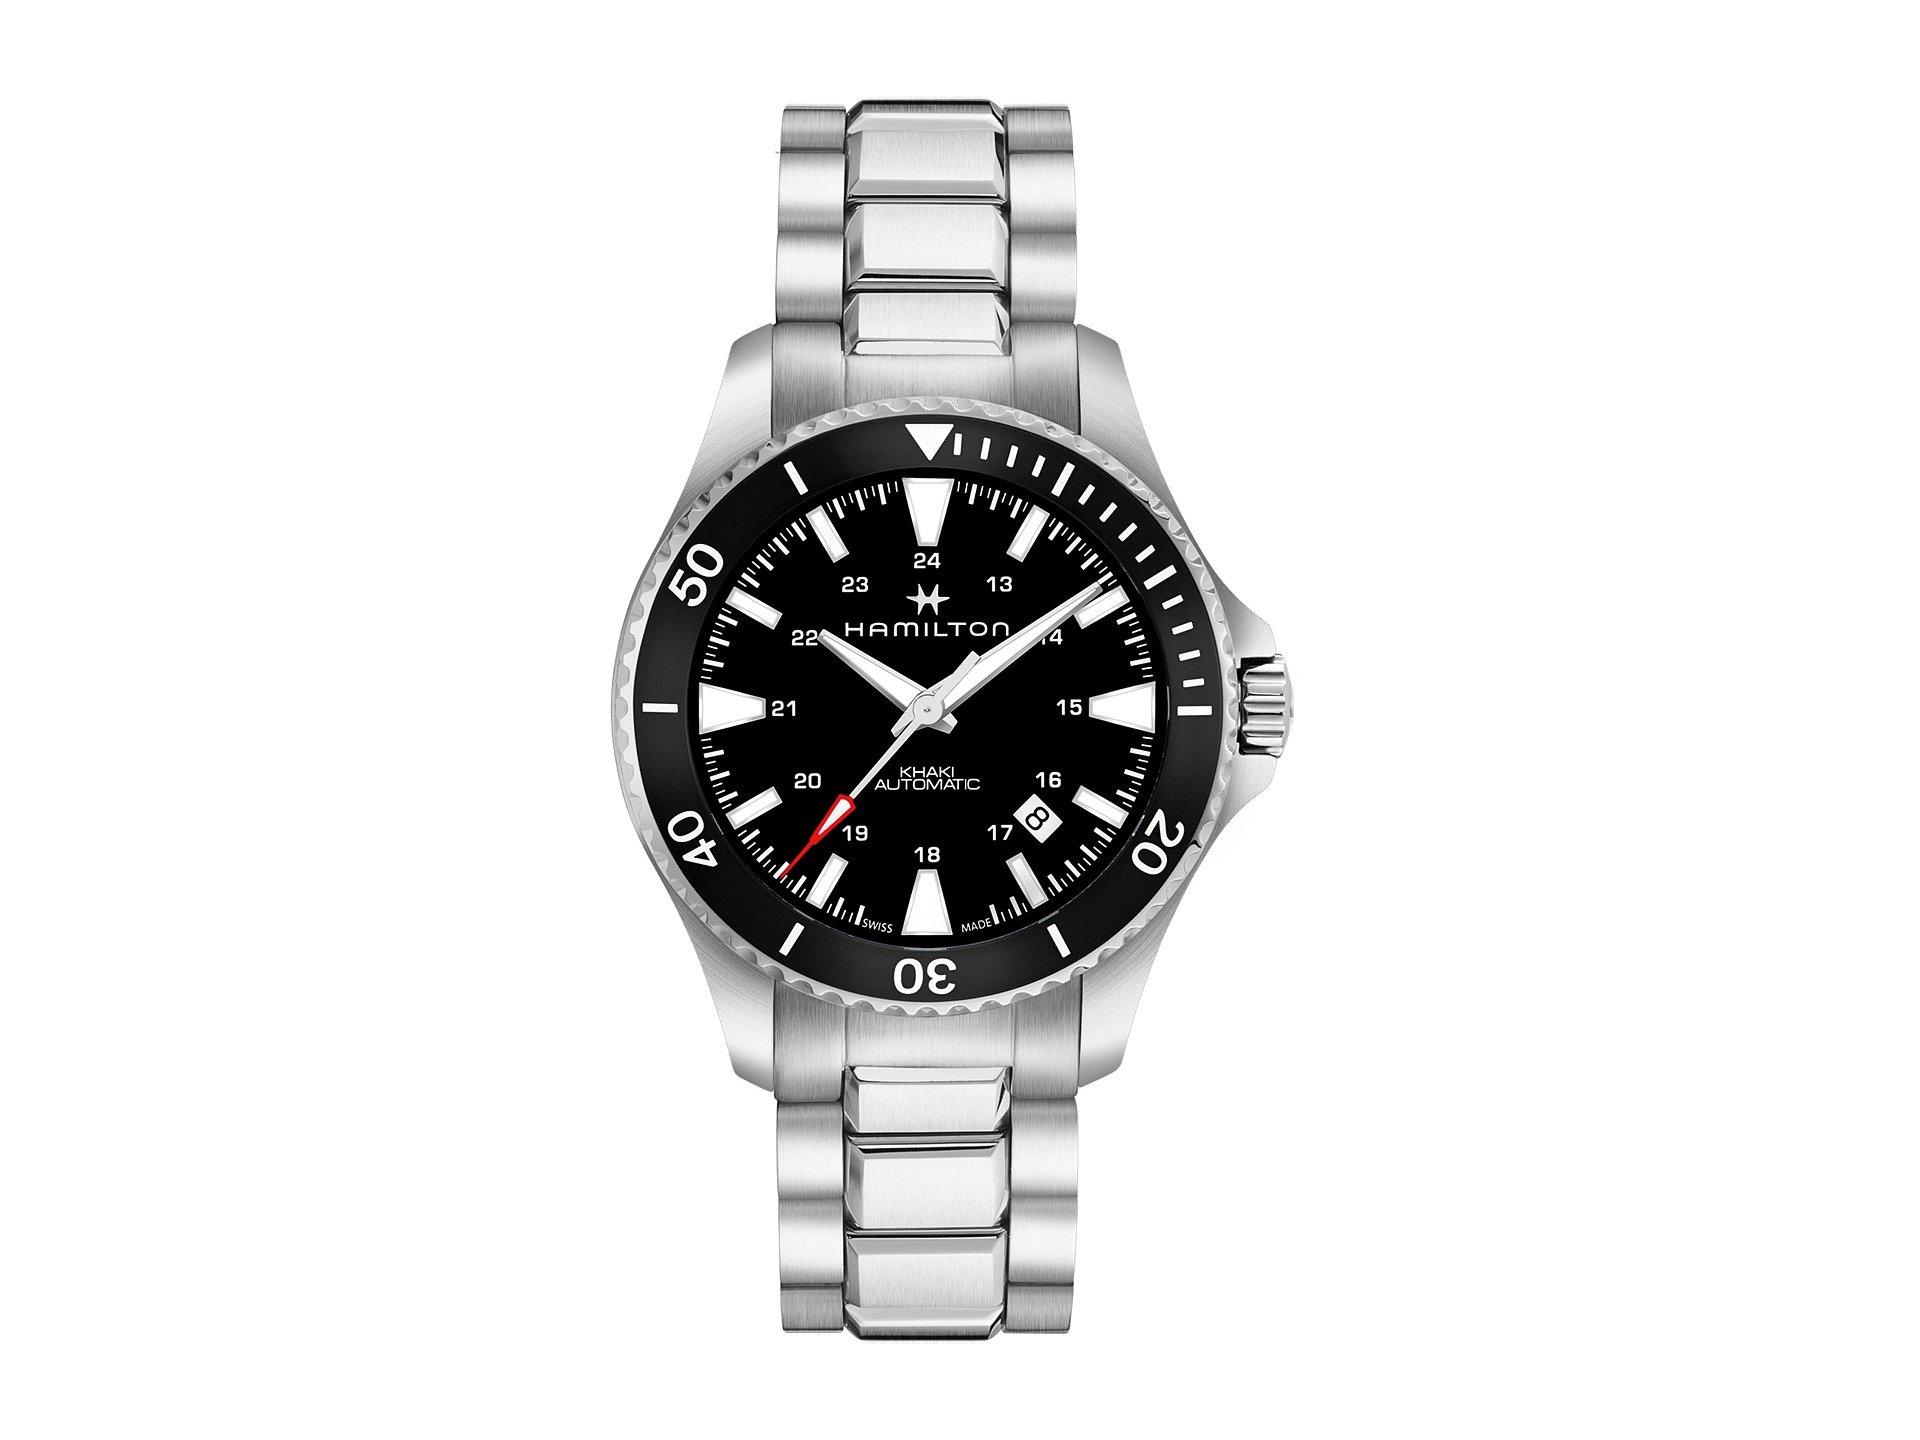 Hamilton Khaki Navy Automatic Movement Black Dial Men's Watch H82335131